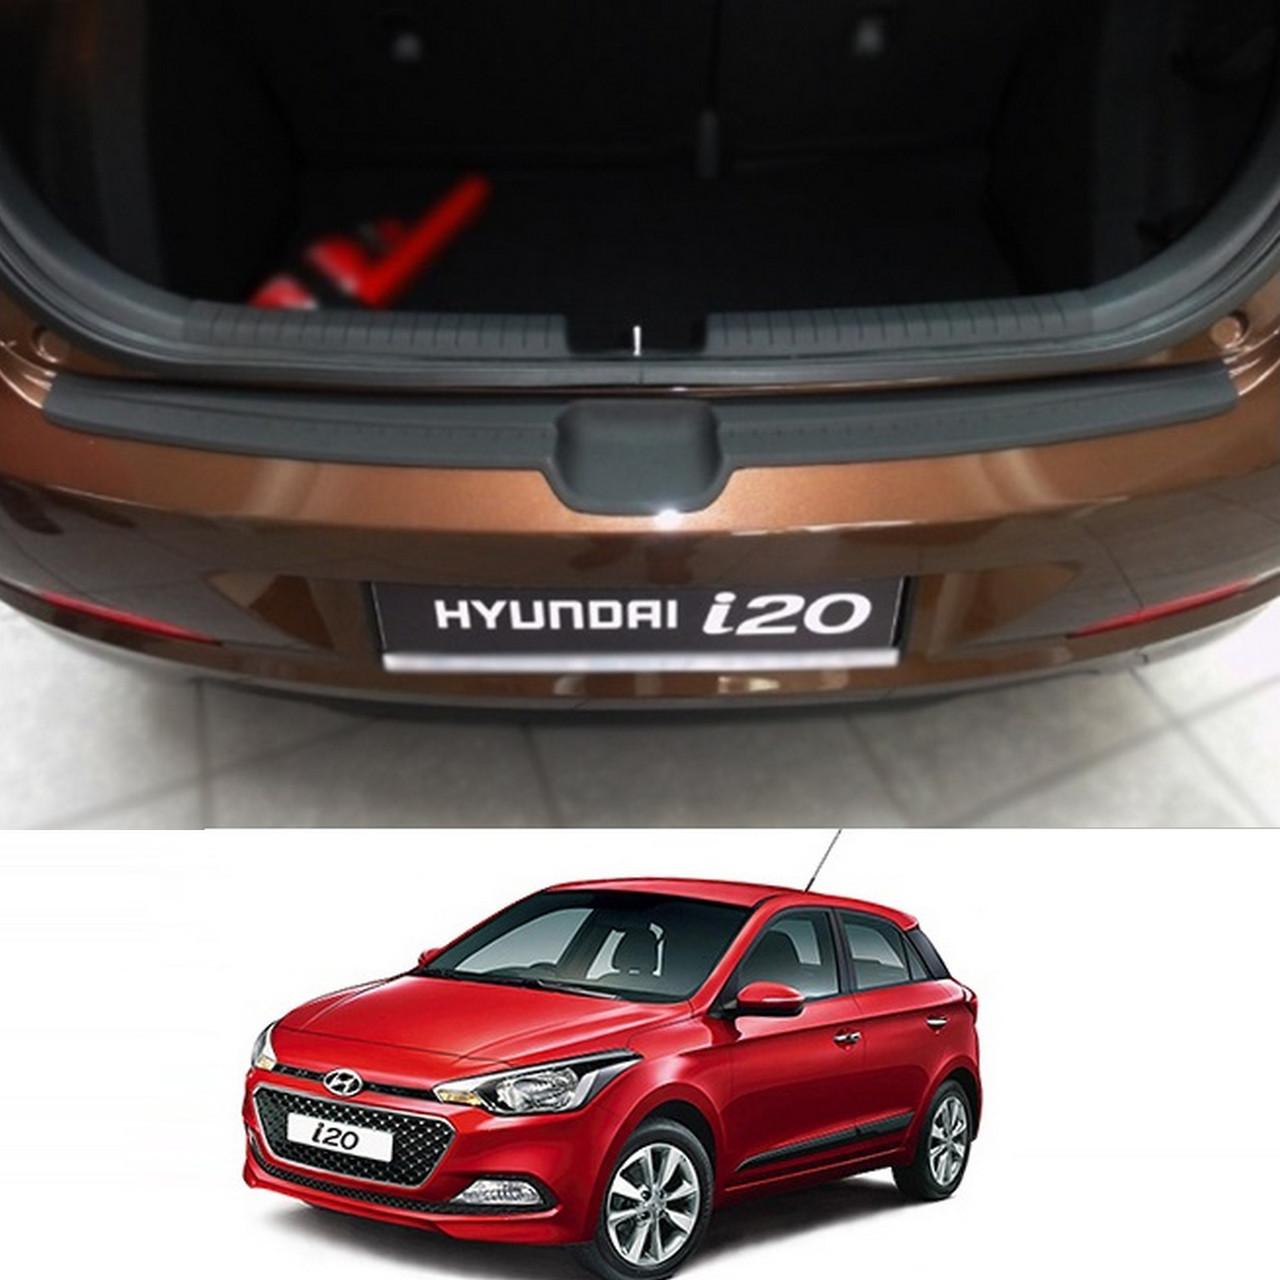 Пластиковая защитная накладка на задний бампер для Hyundai i20 Mk2 до-рестайлинг 2014-2018